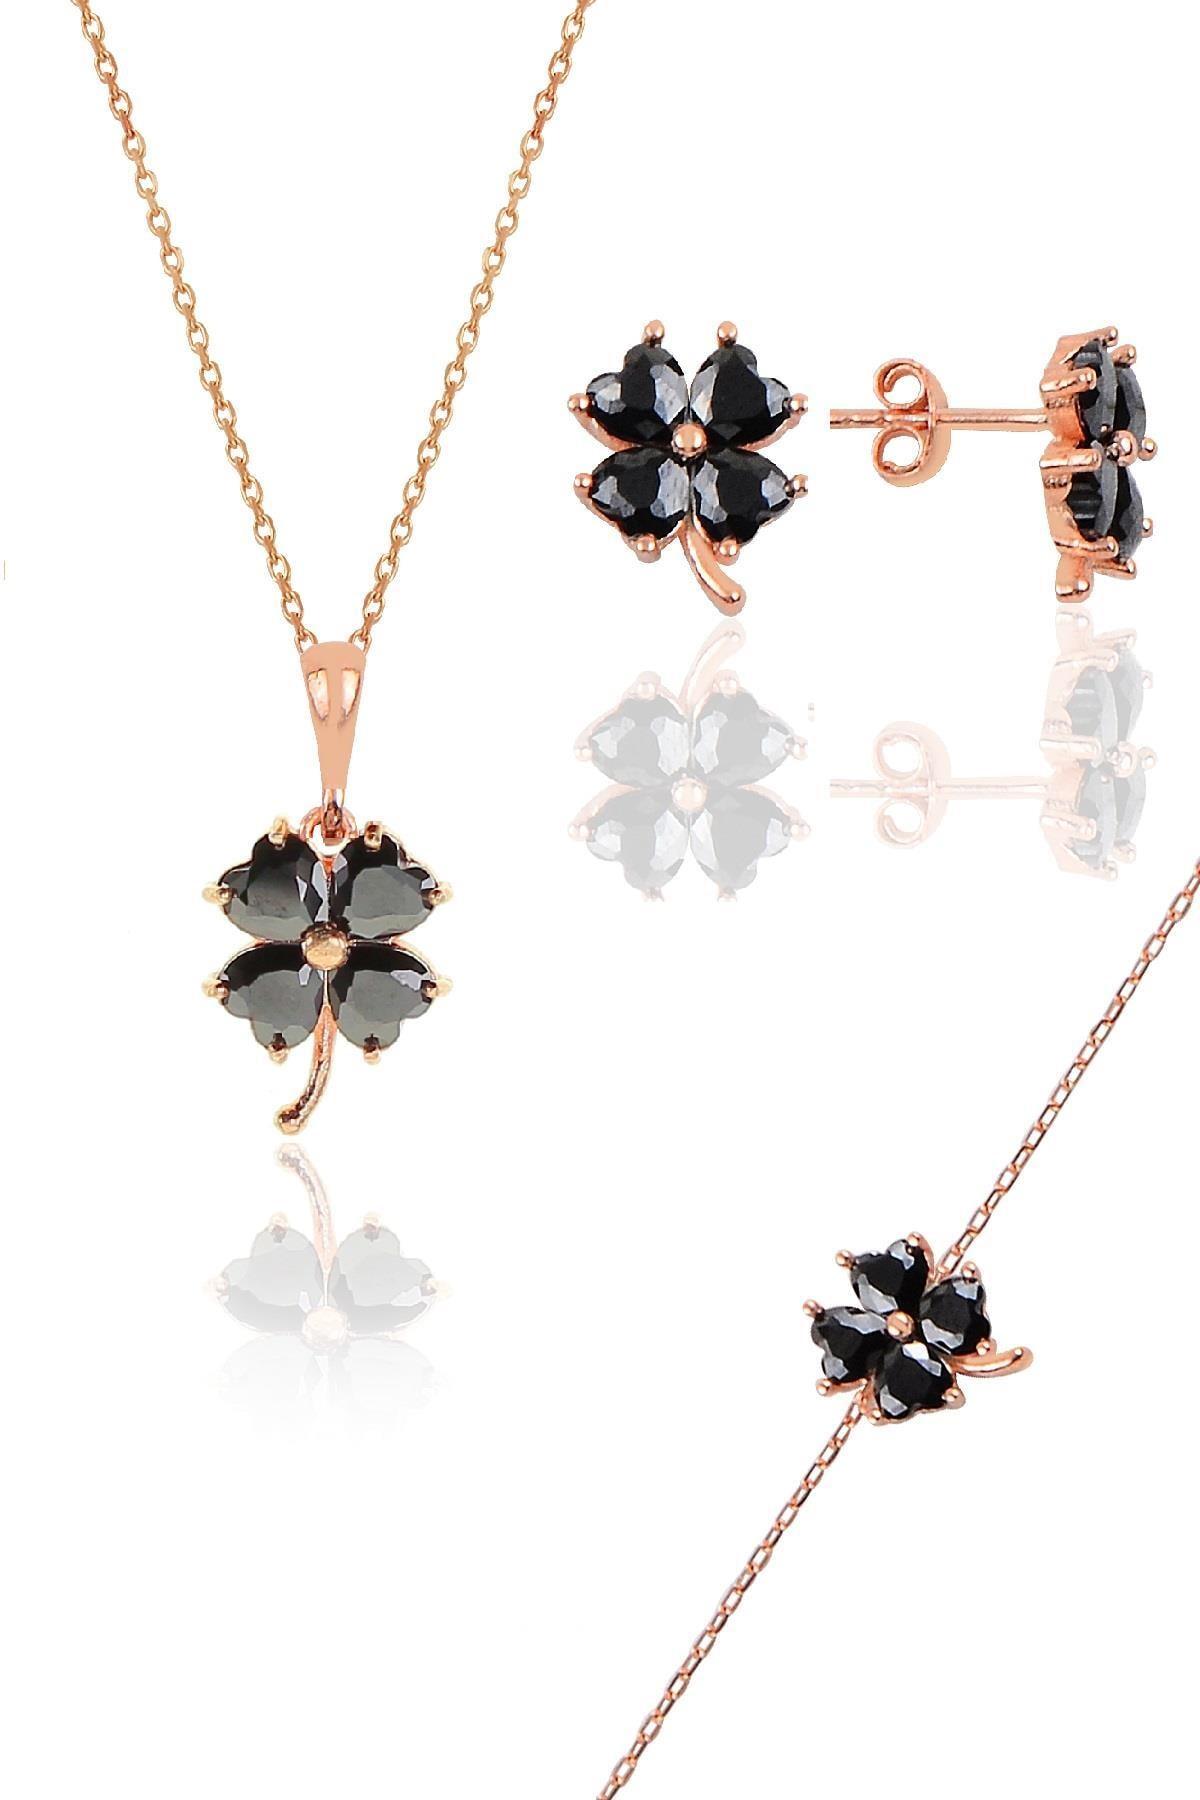 Söğütlü Silver Gümüş rose siyah renkli yonca modeli üçlü set